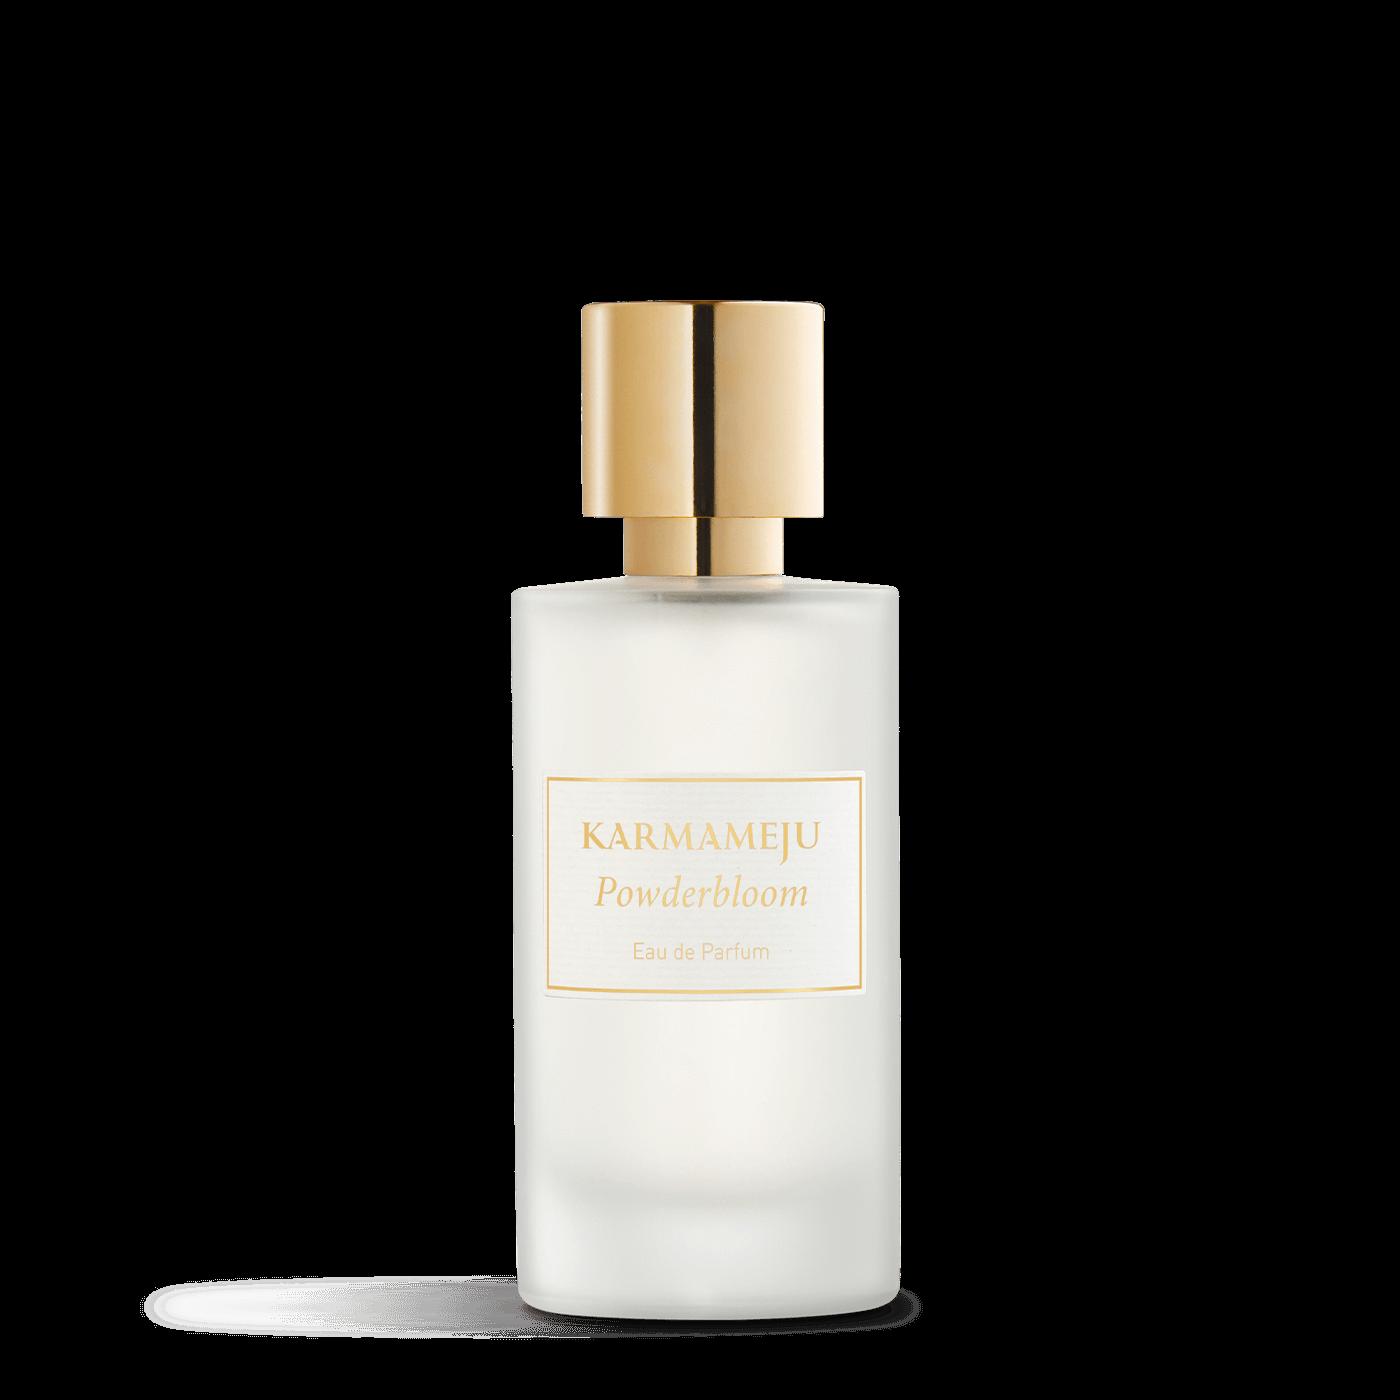 Karmameju POWDERBLOOM / Eau de Parfum